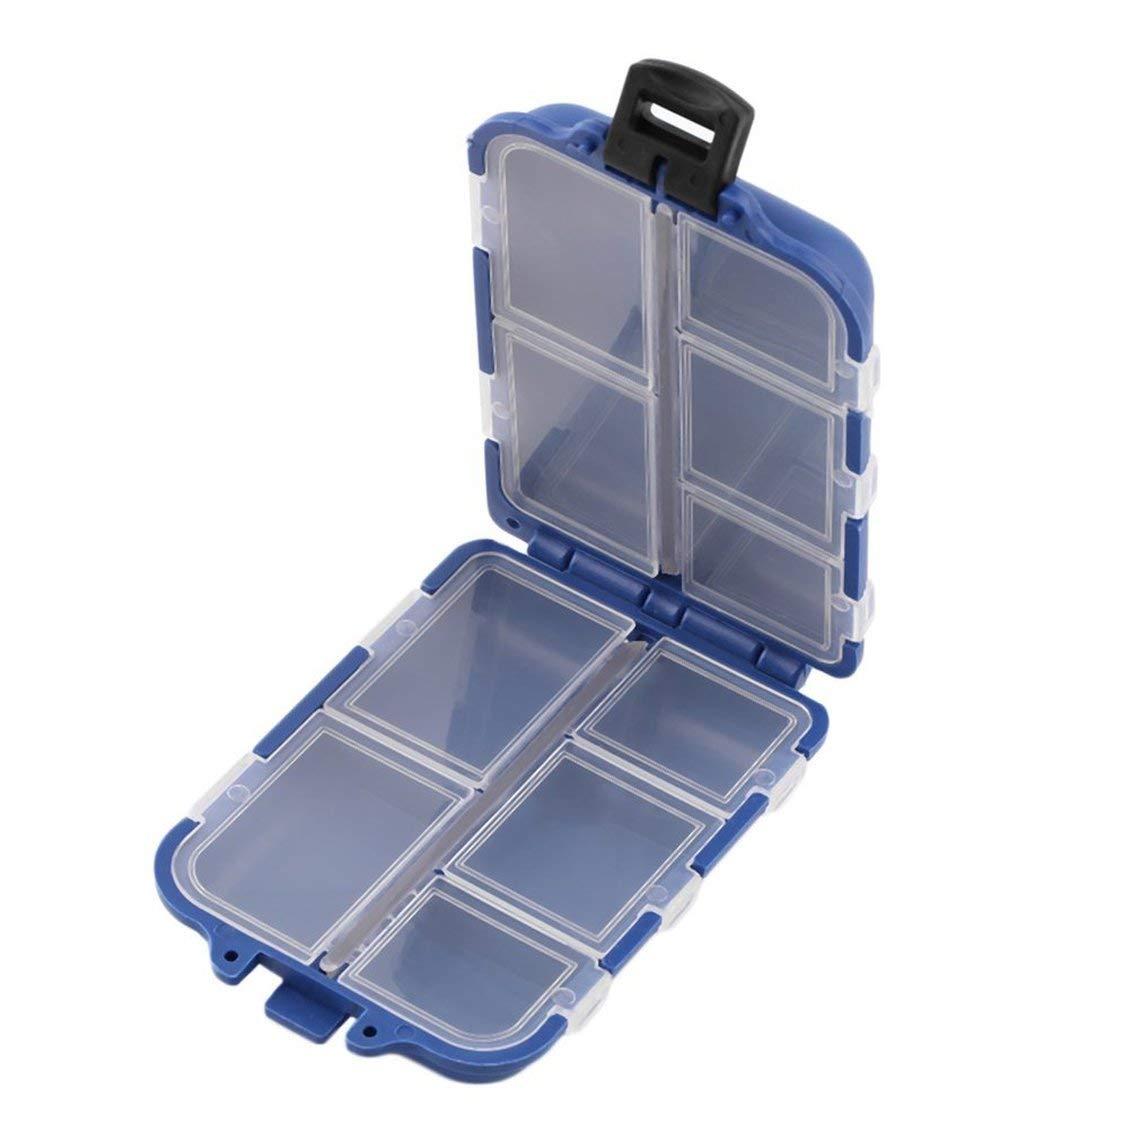 Momorain 10 Compartimentos Caja de Almacenamiento Caja Pesca con Mosca Se/ñuelo Cuchara Gancho Cebo Caja de trastos Caja Caja de Accesorios de Pesca